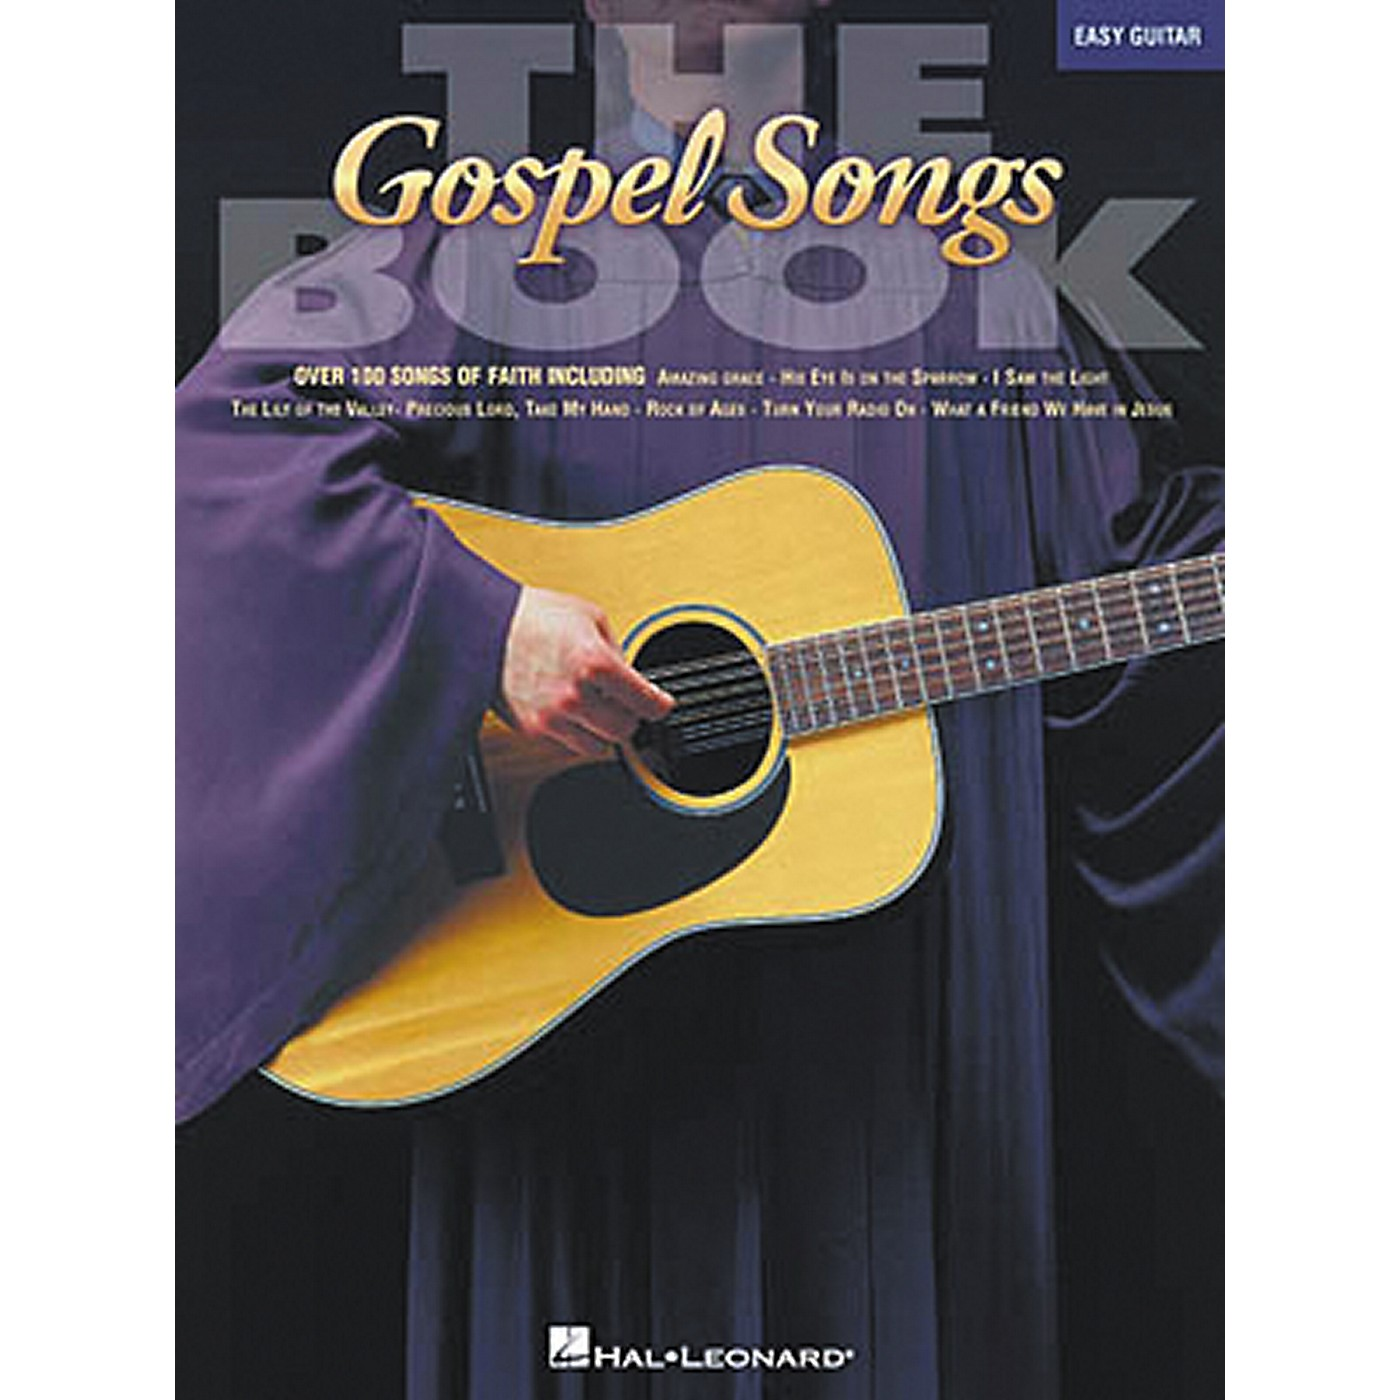 Hal Leonard The Gospel Songs Easy Guitar Songbook thumbnail